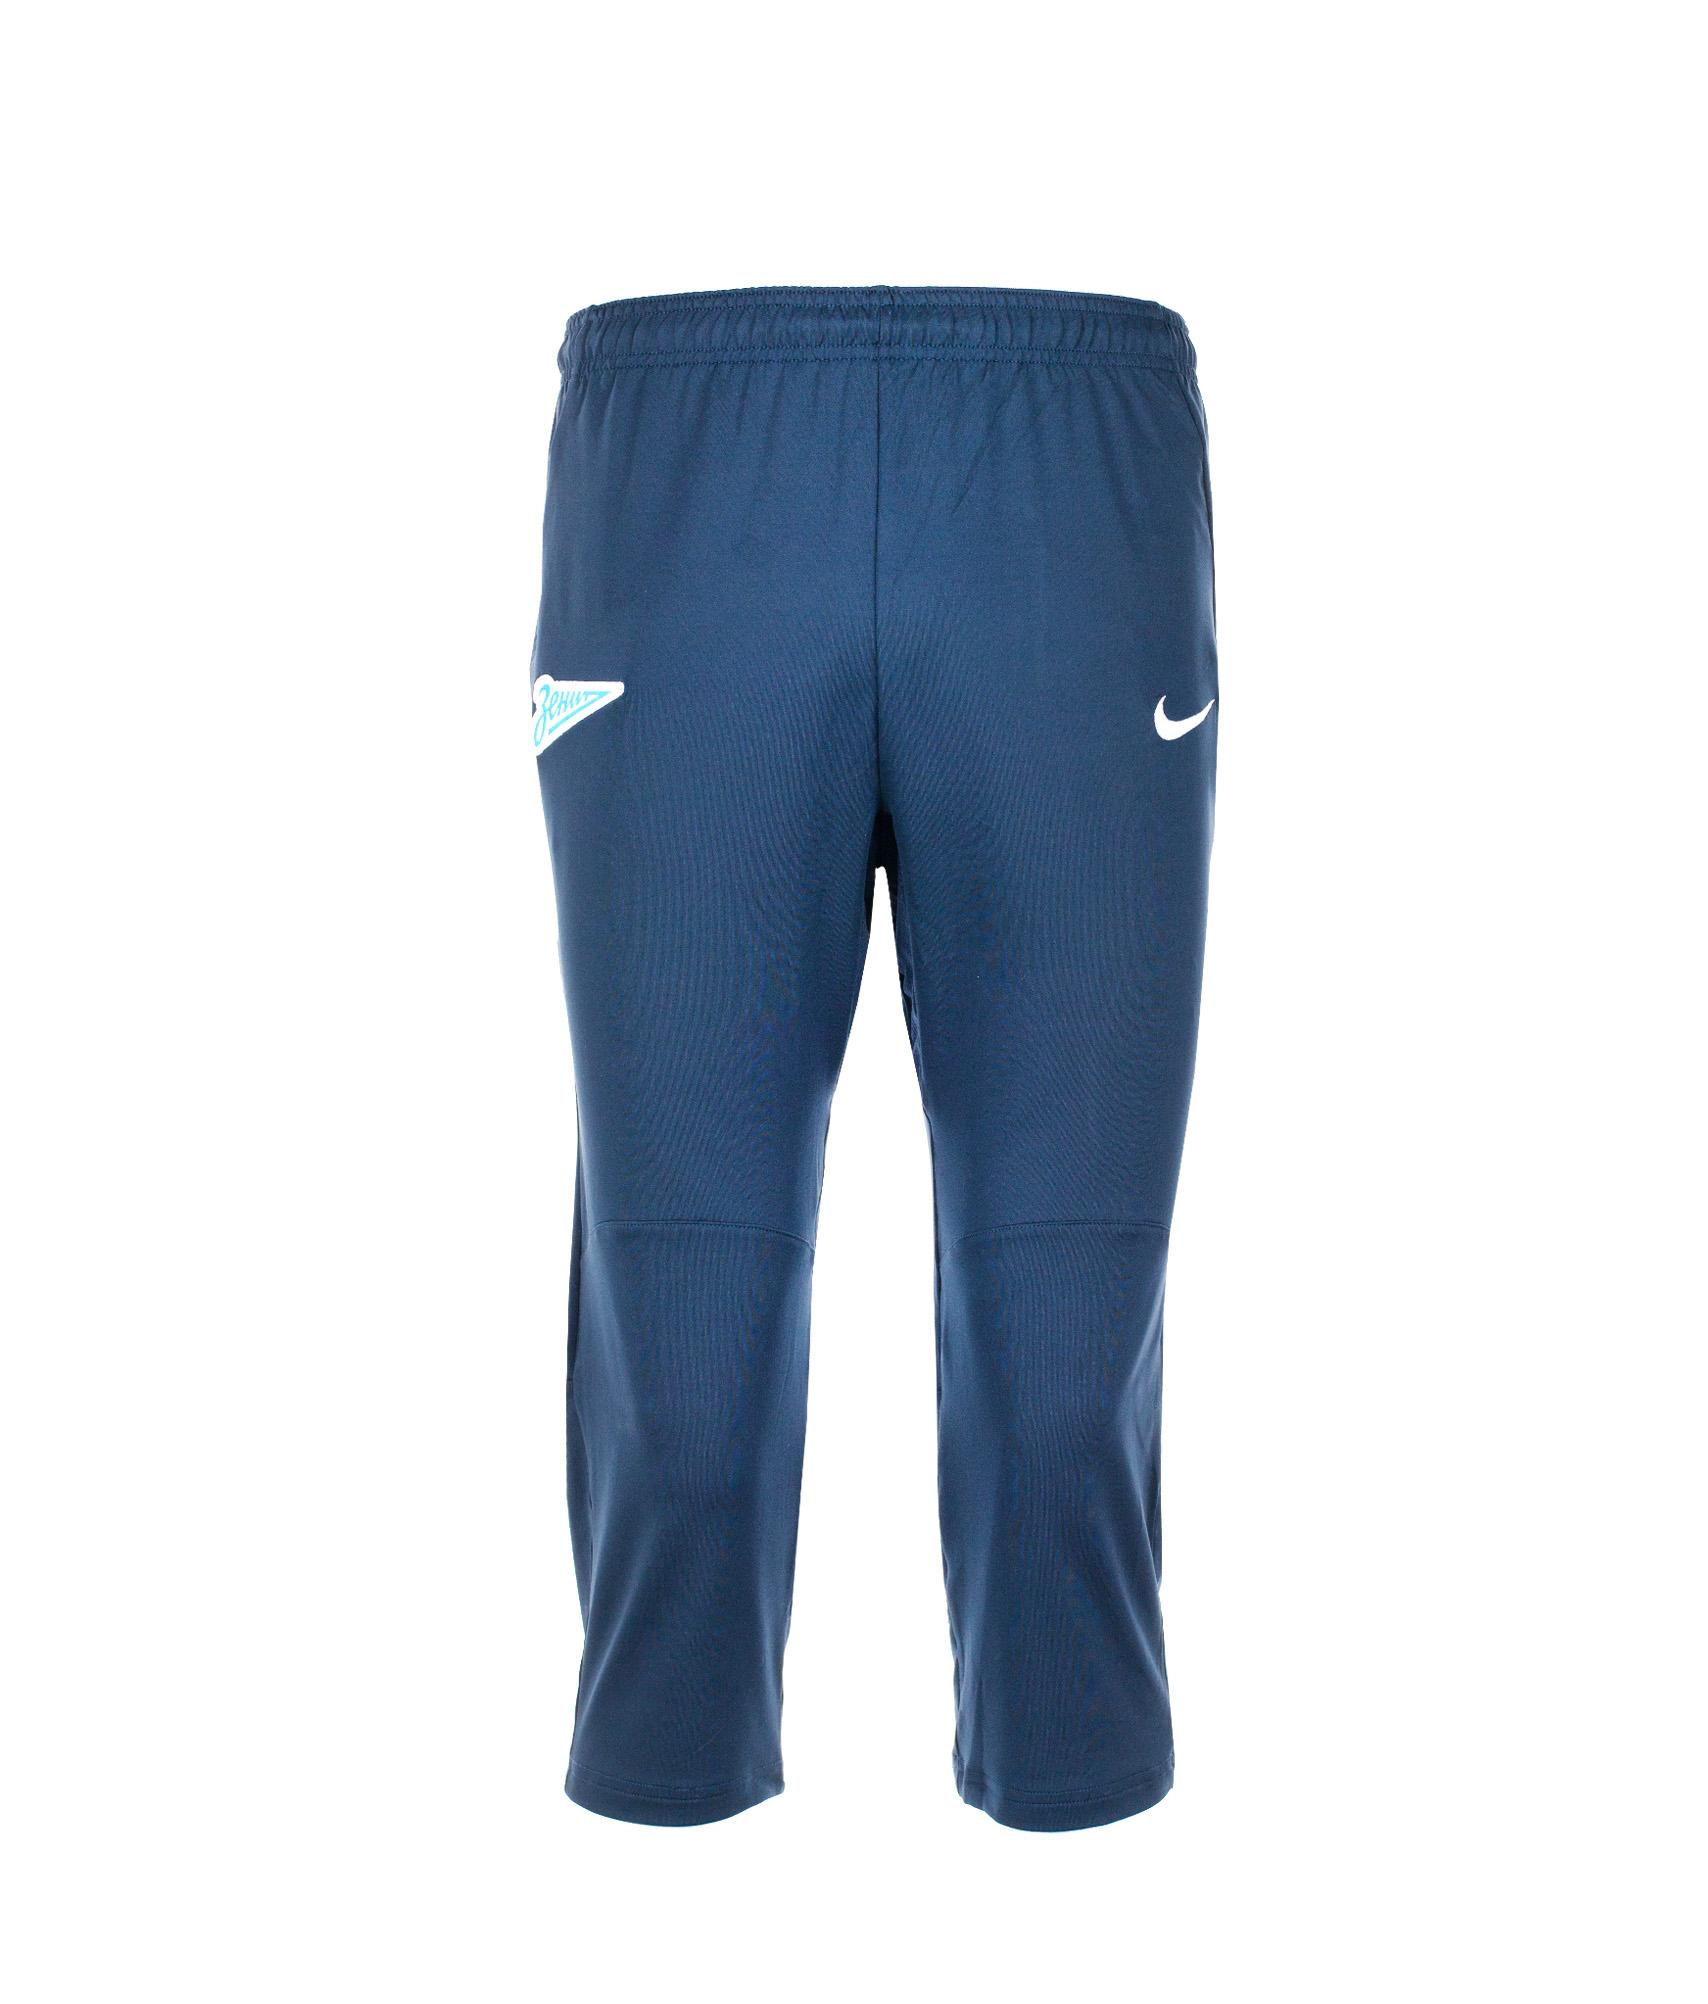 Брюки Nike Zenit Select 3/4 Tech Pant, Цвет-Синий, Размер-XL